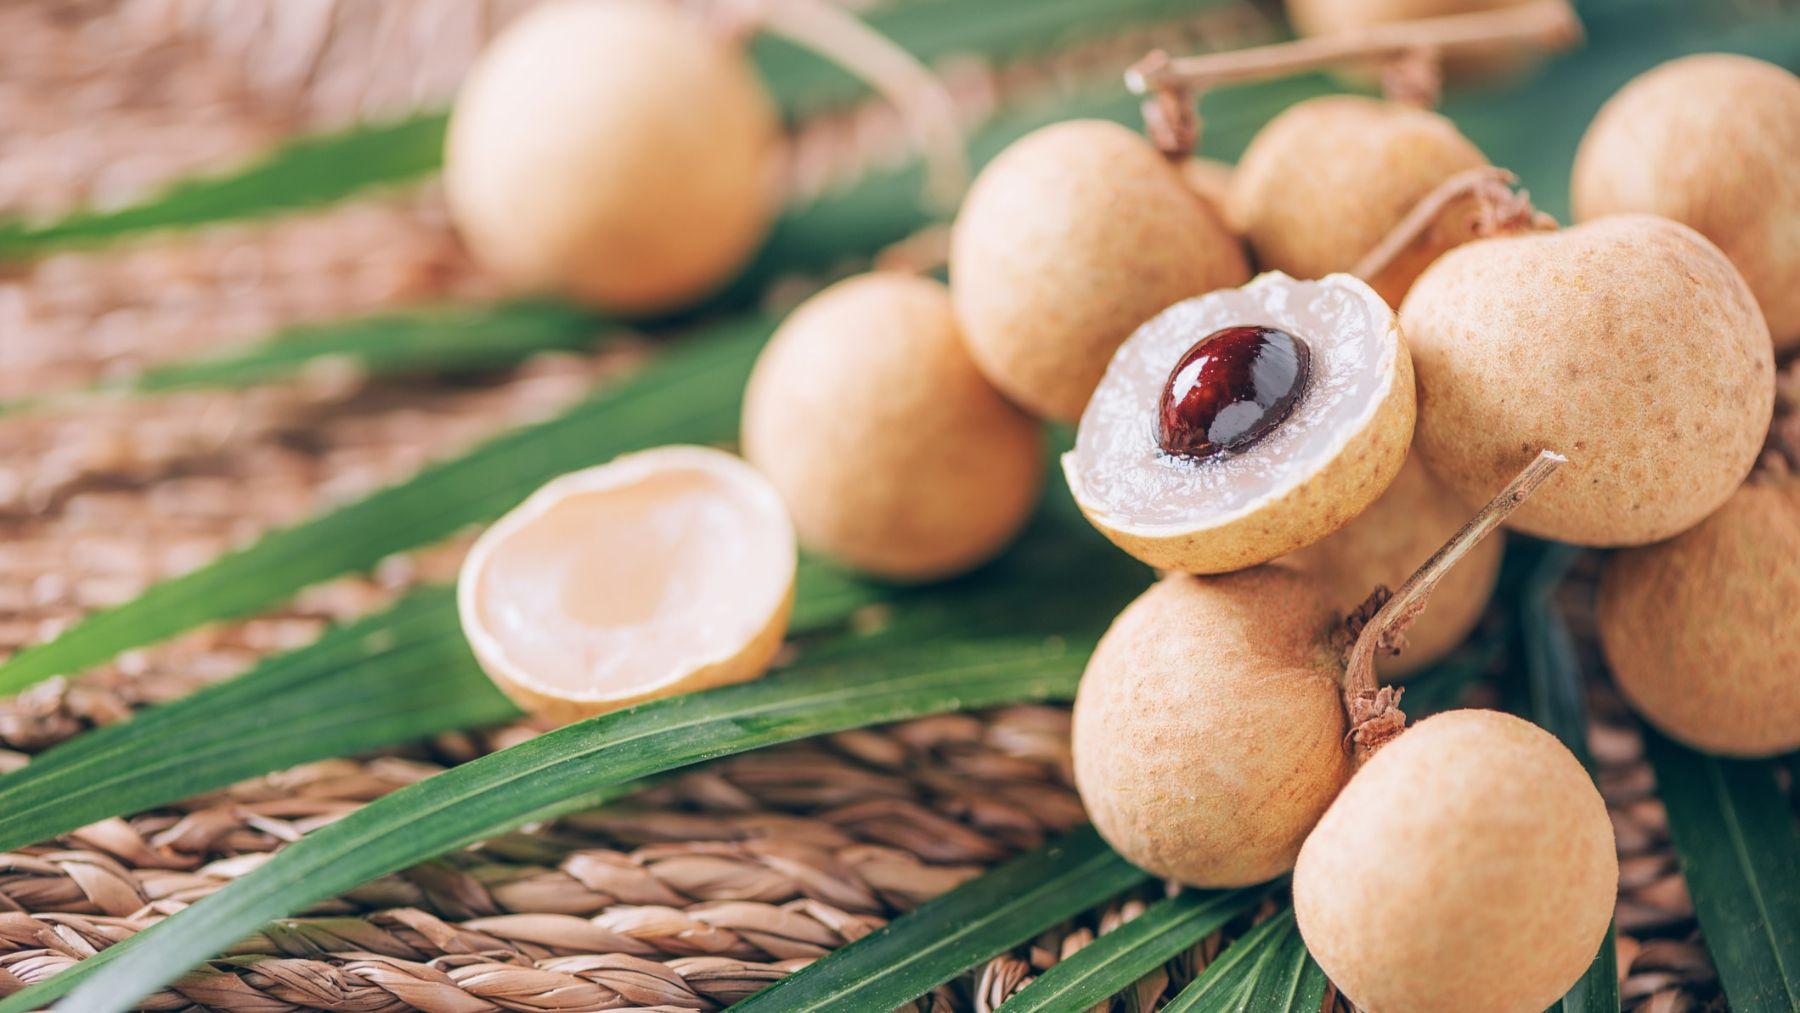 Descubre todas las propiedades de esta fruta china